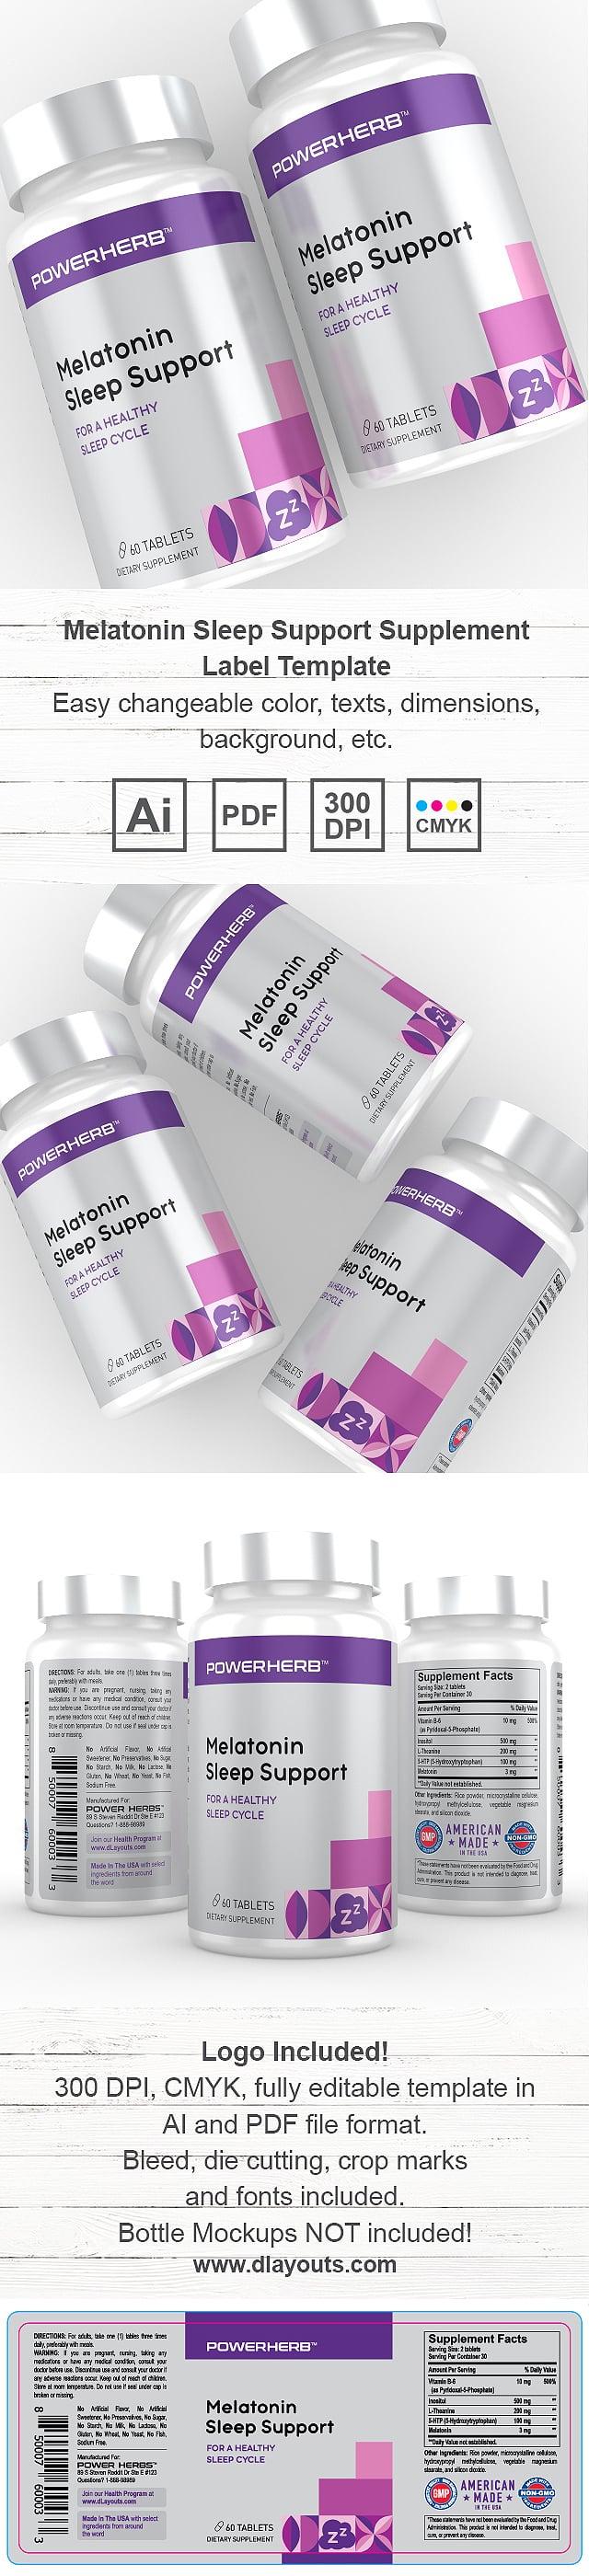 Sleep Support Supplement Label Template